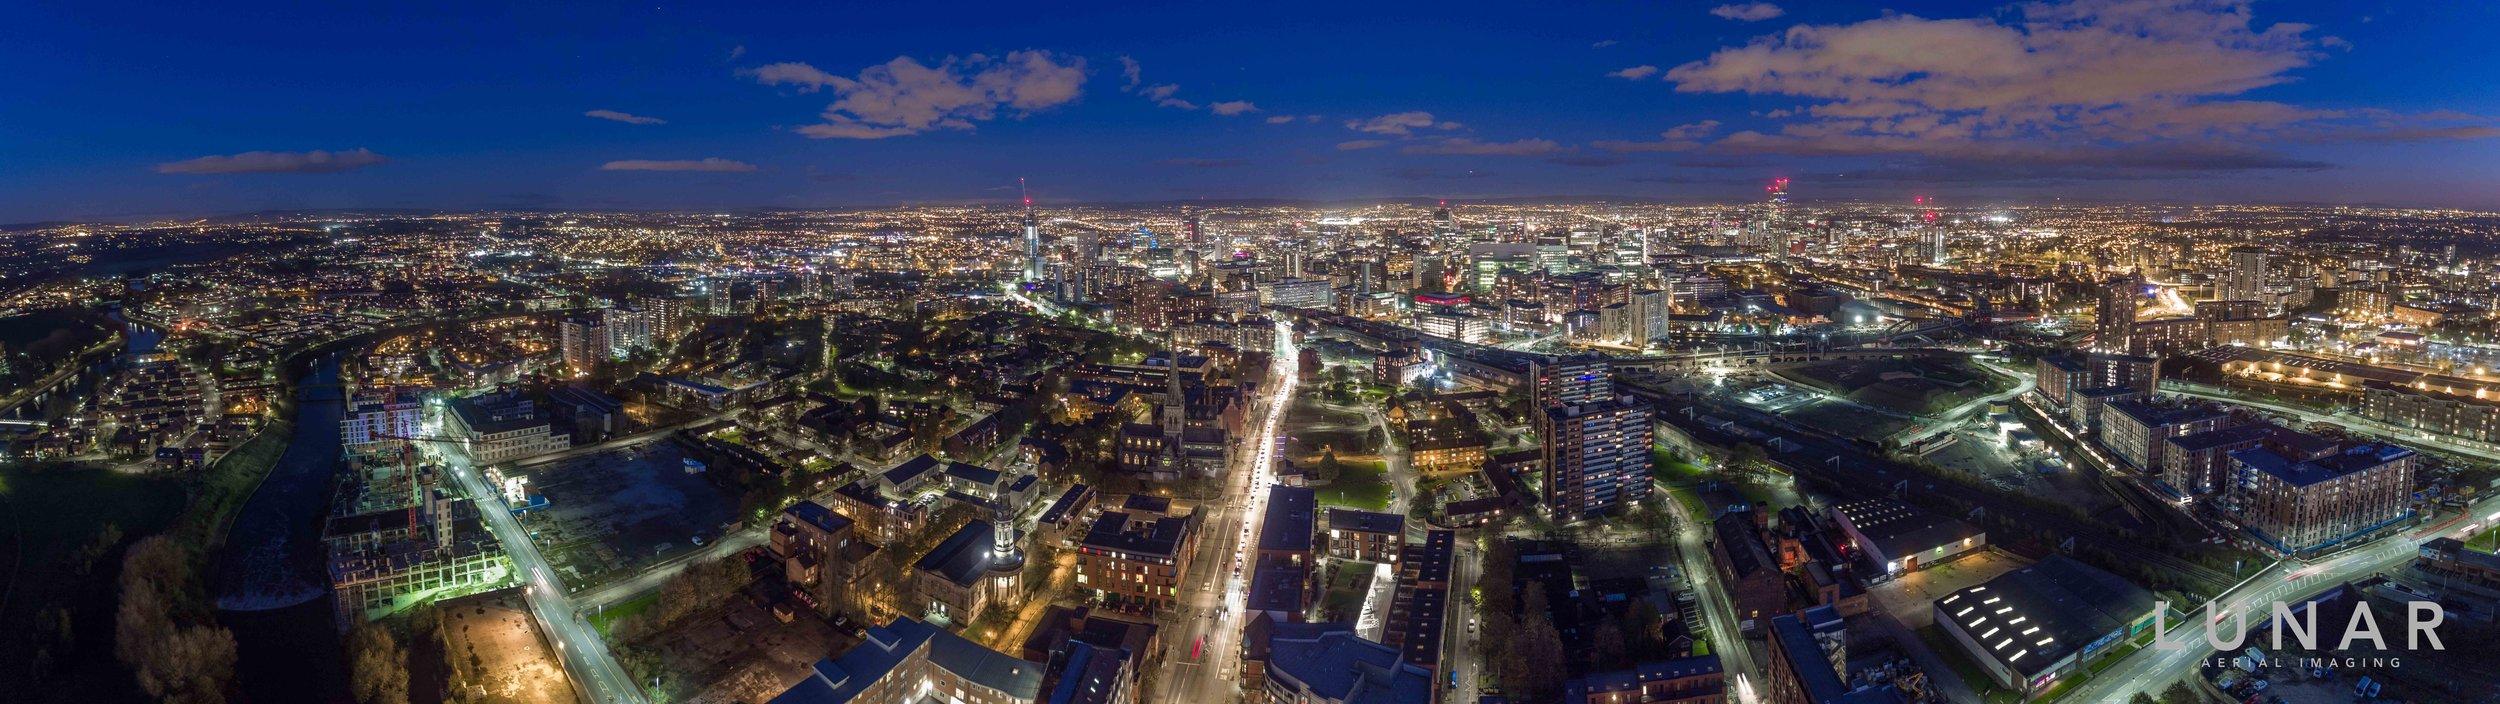 Panorama aerial photo Manchester at night.jpg